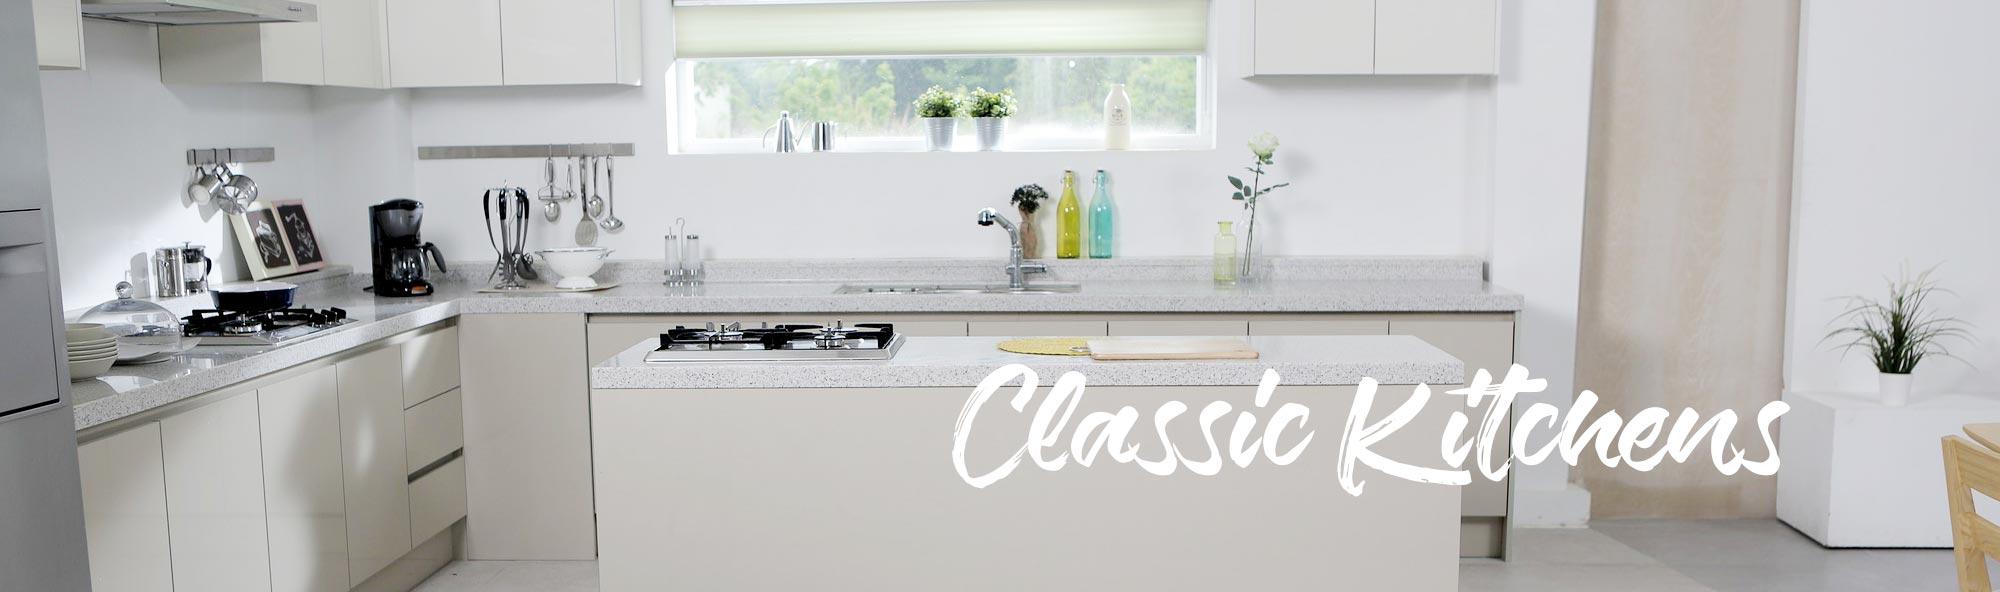 classic-kitchen-renovations, Kitchen Renovation, Bathroom Renovation, House Renovation Auckland